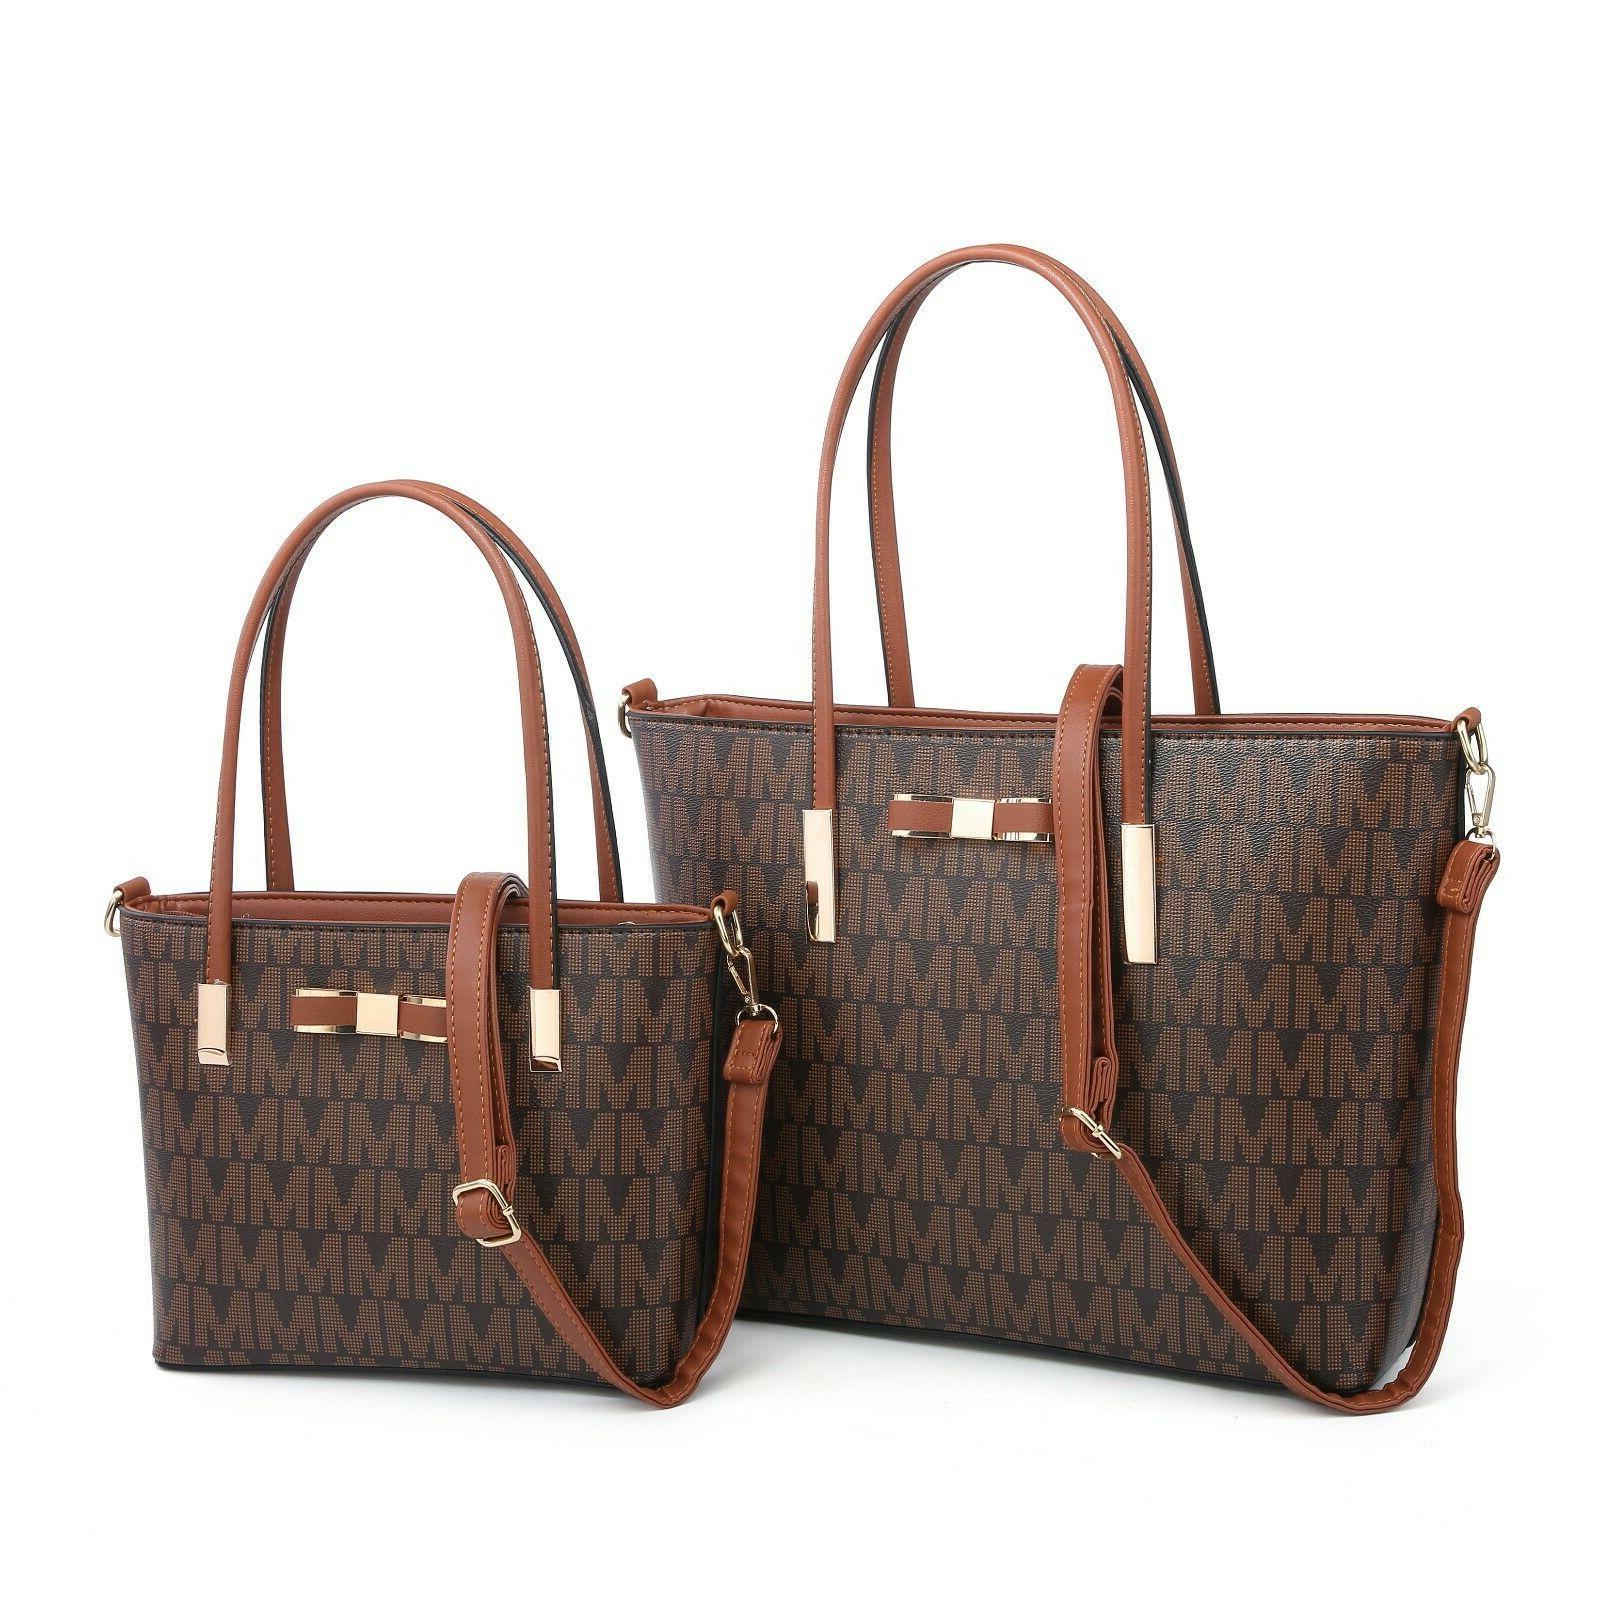 Women's Satchel Faux Leather Hobo Handbags Should Large Tote